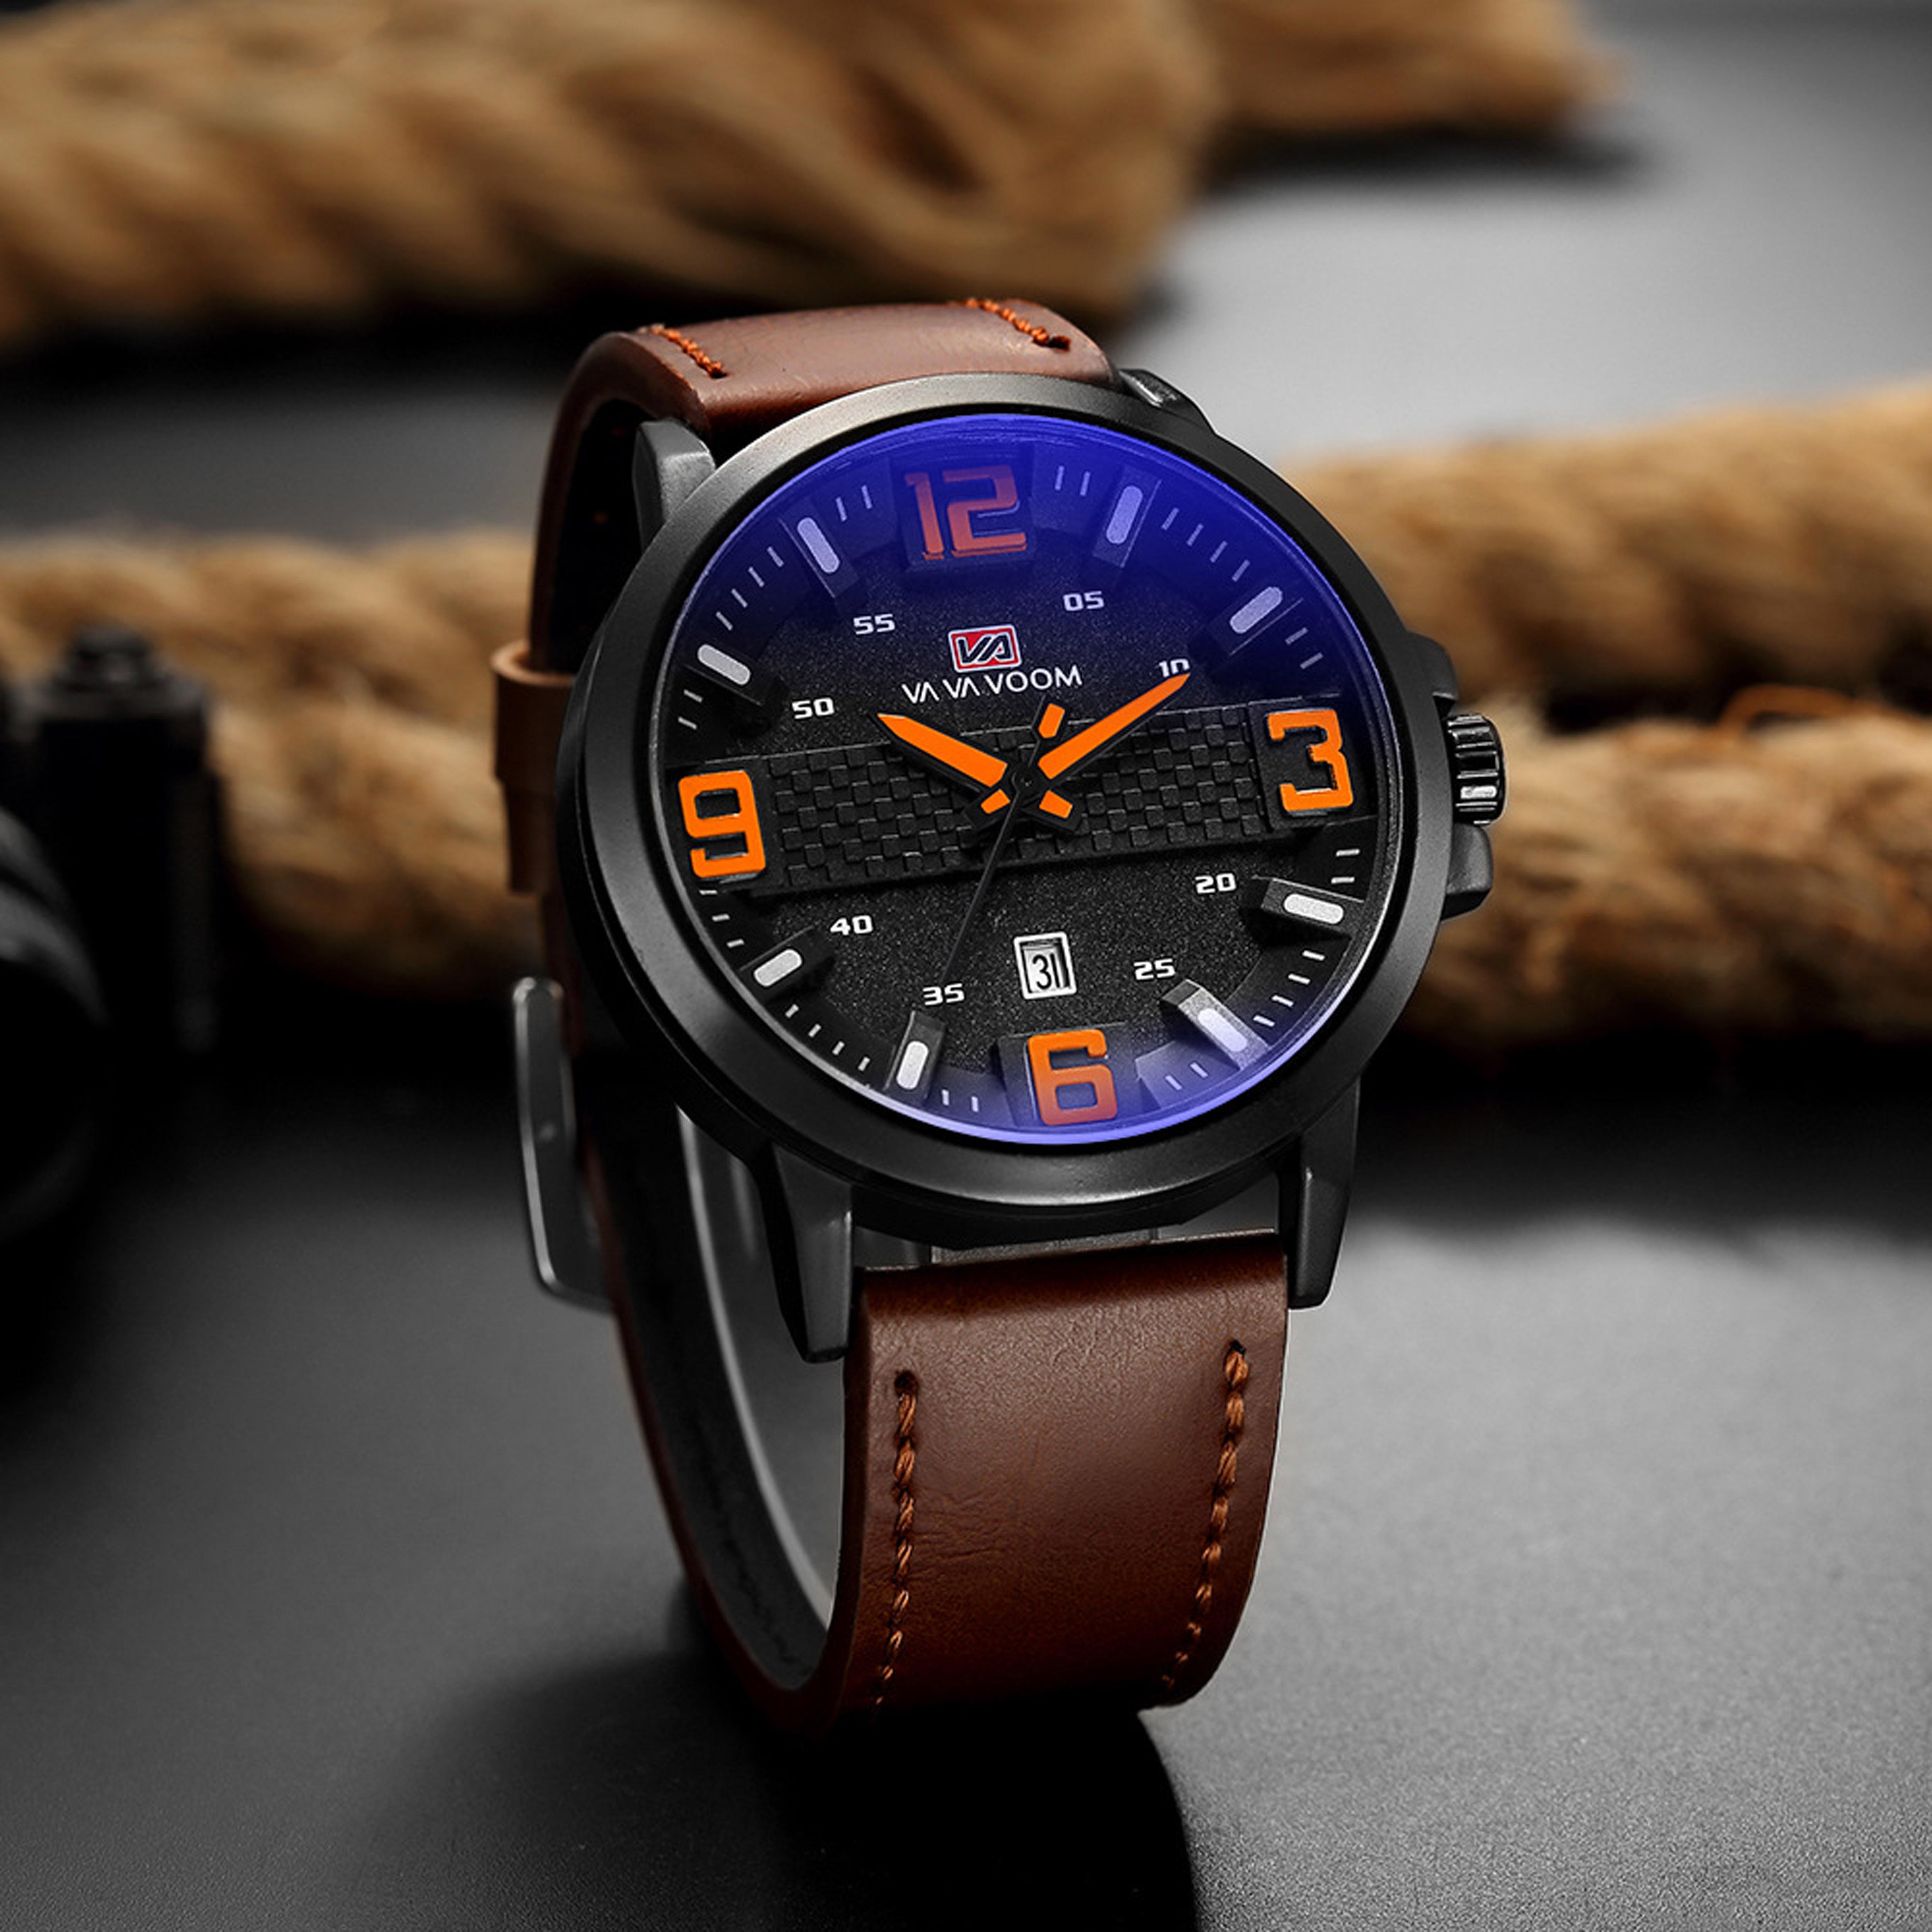 galery shop jam tangan pria  fashion jam tangan tali leather kaca kristal free box jam tangan anti air jam tangan quarts import ori vava02